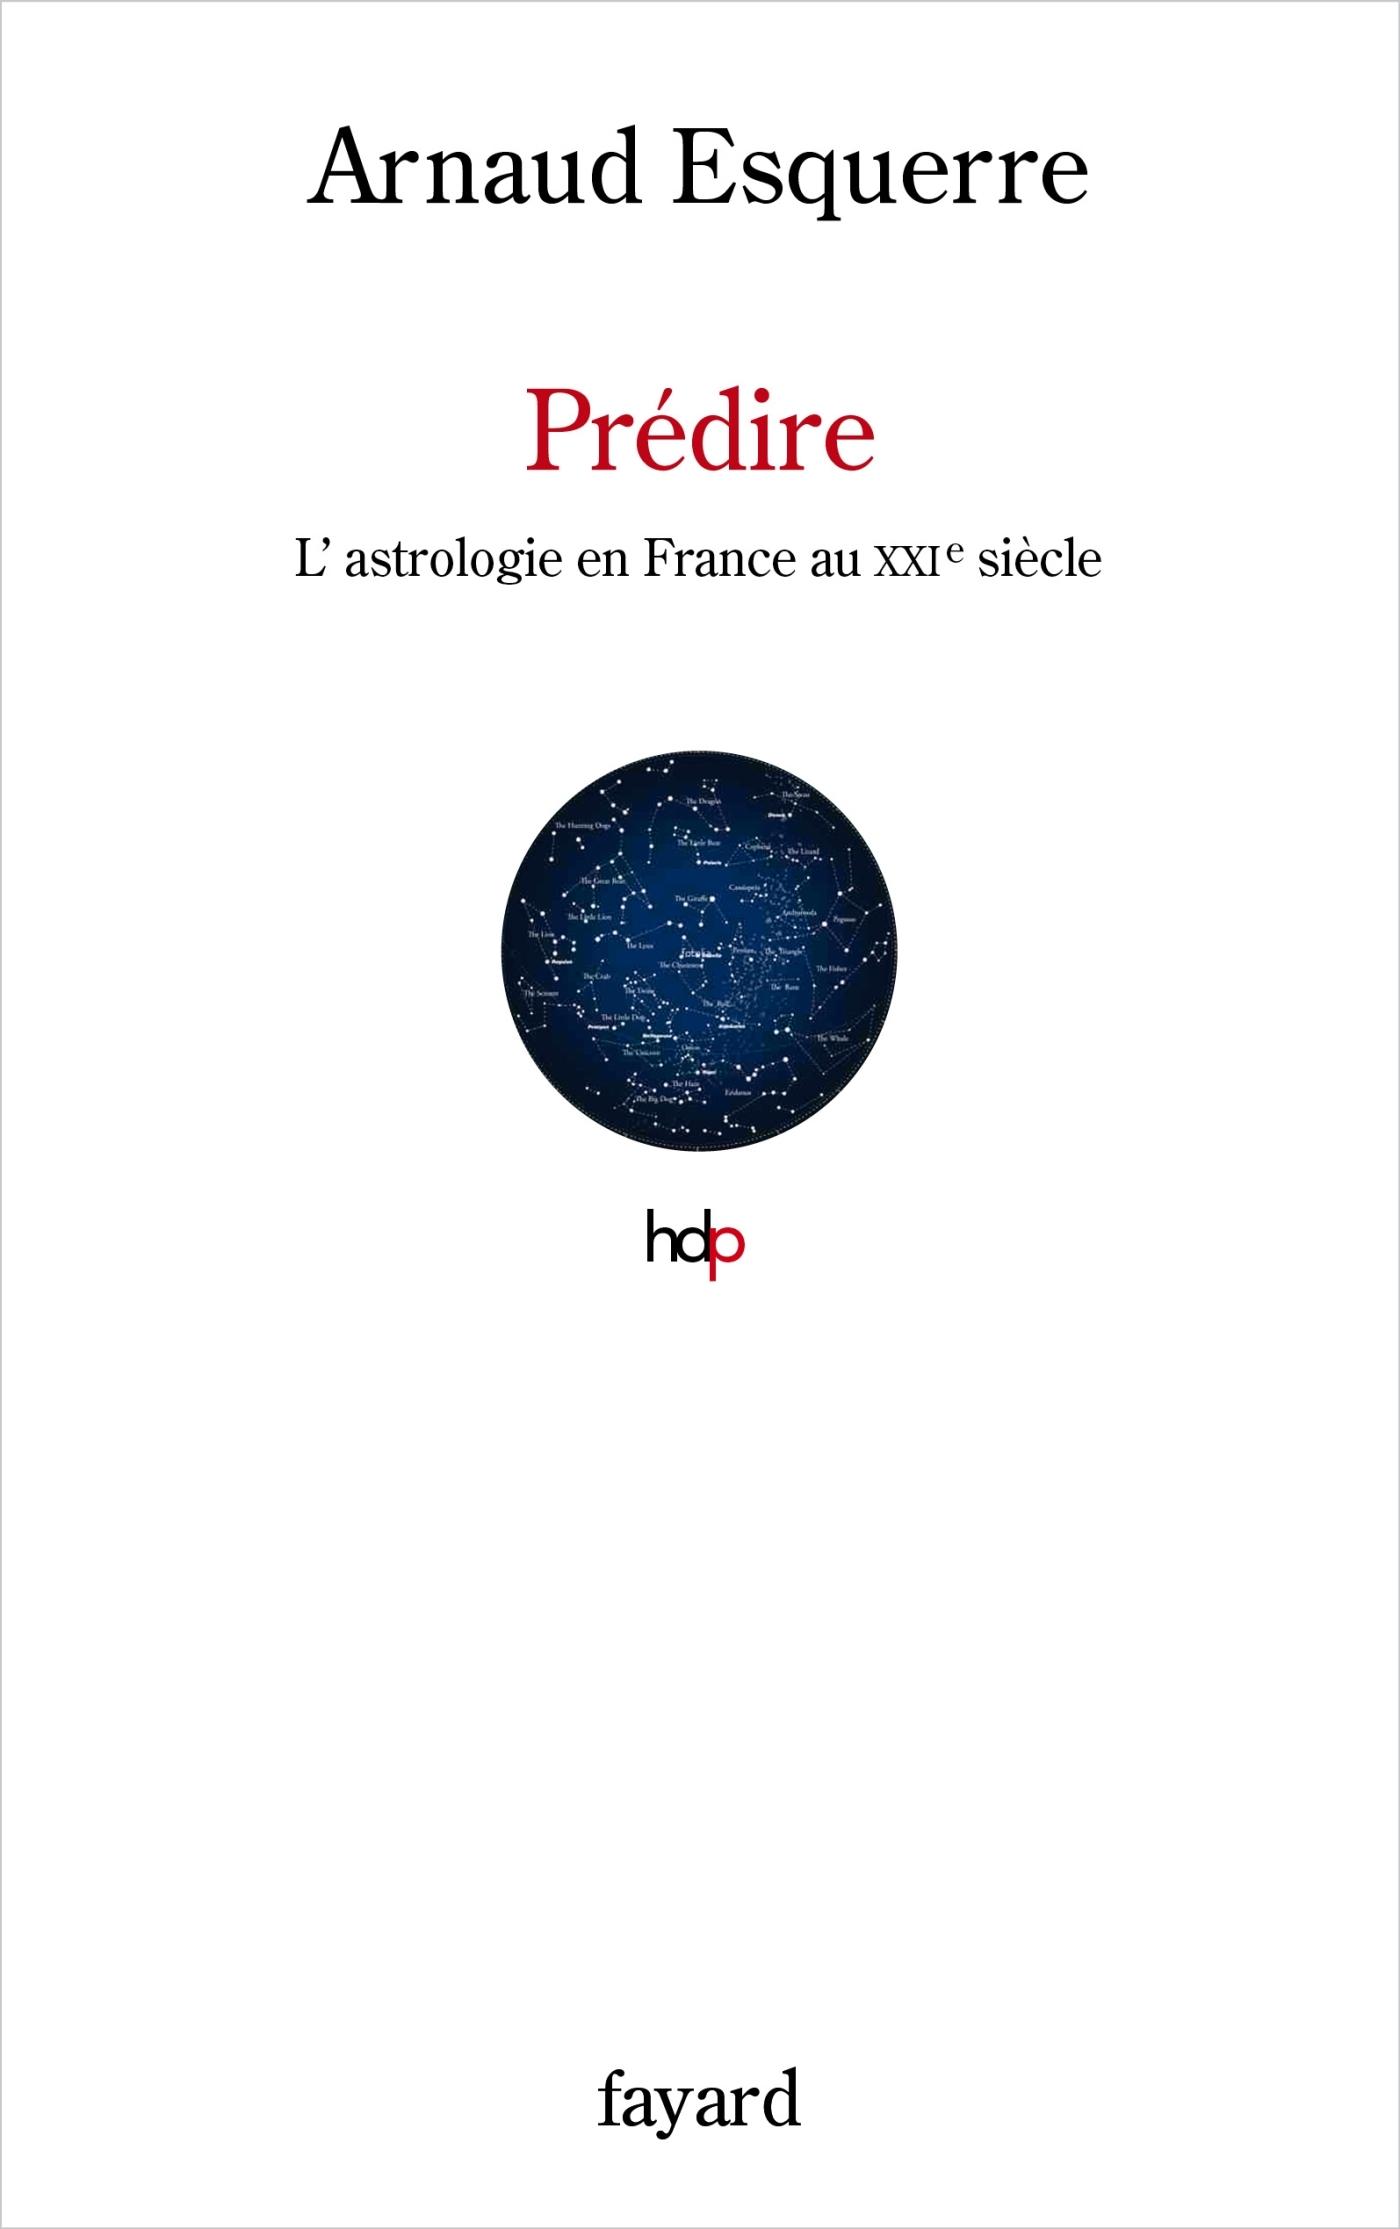 PREDIRE - L'ASTROLOGIE EN FRANCE AU XXIE SIECLE